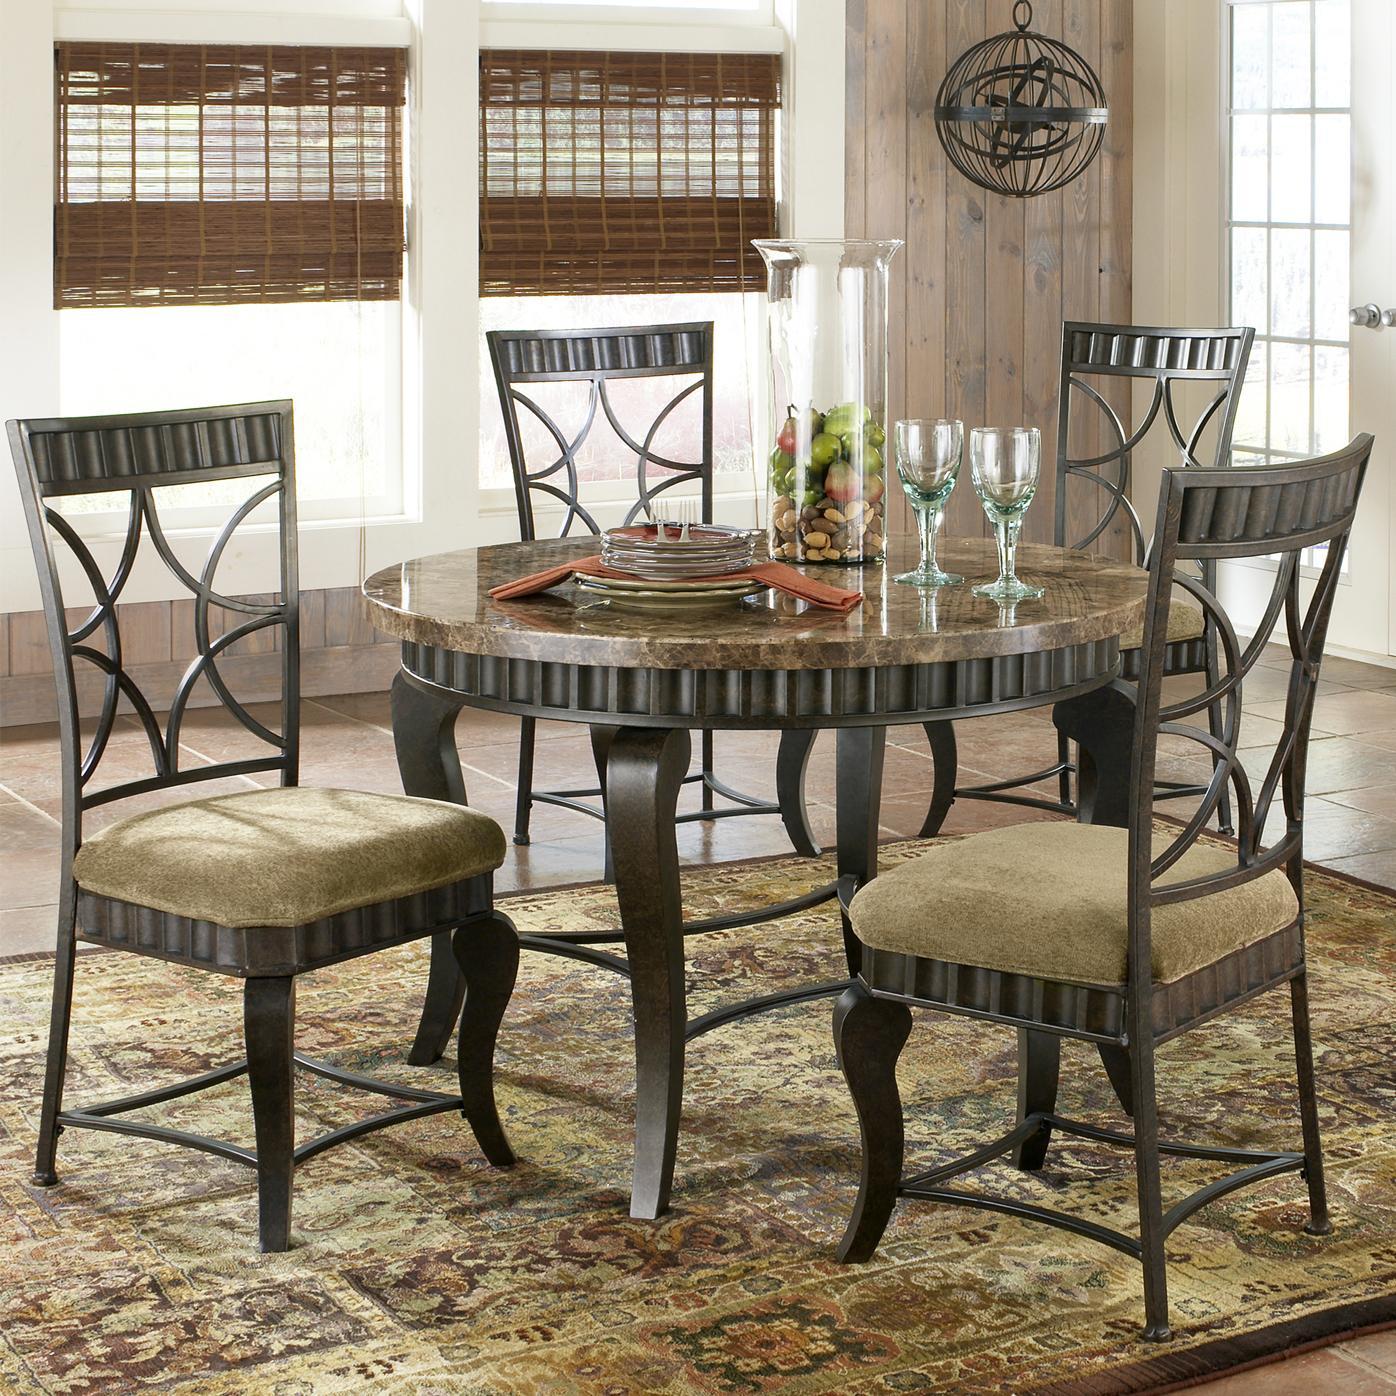 steve silver hamlyn 5 piece round faux marble top metal dining table set olinde 39 s furniture. Black Bedroom Furniture Sets. Home Design Ideas